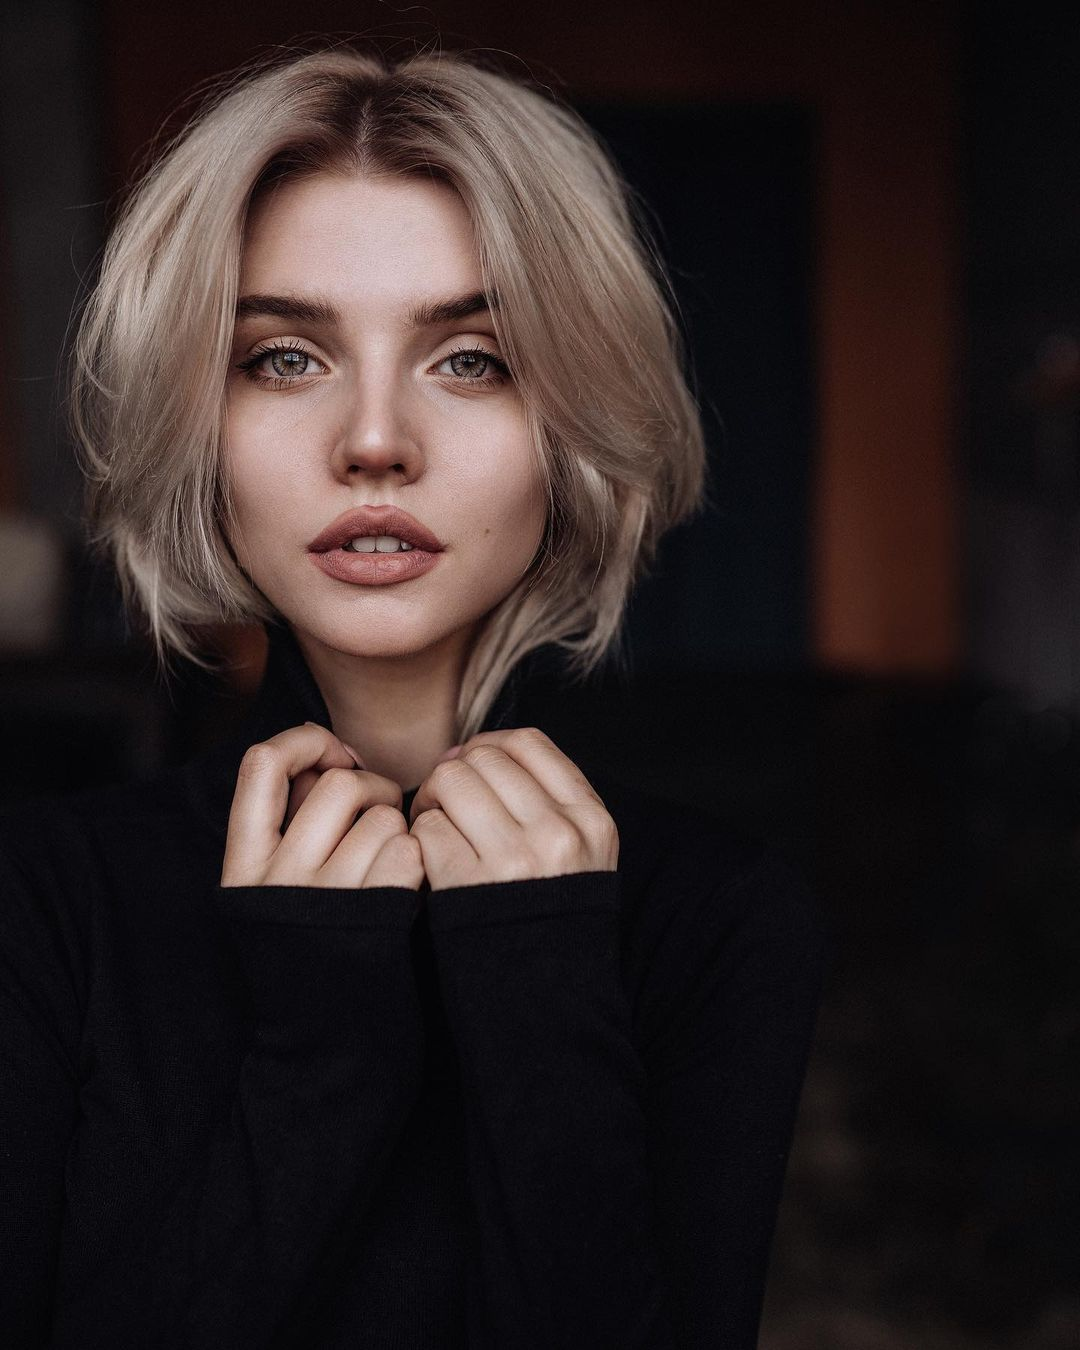 Tatyana Prikmeta by Alena Andryushchenko